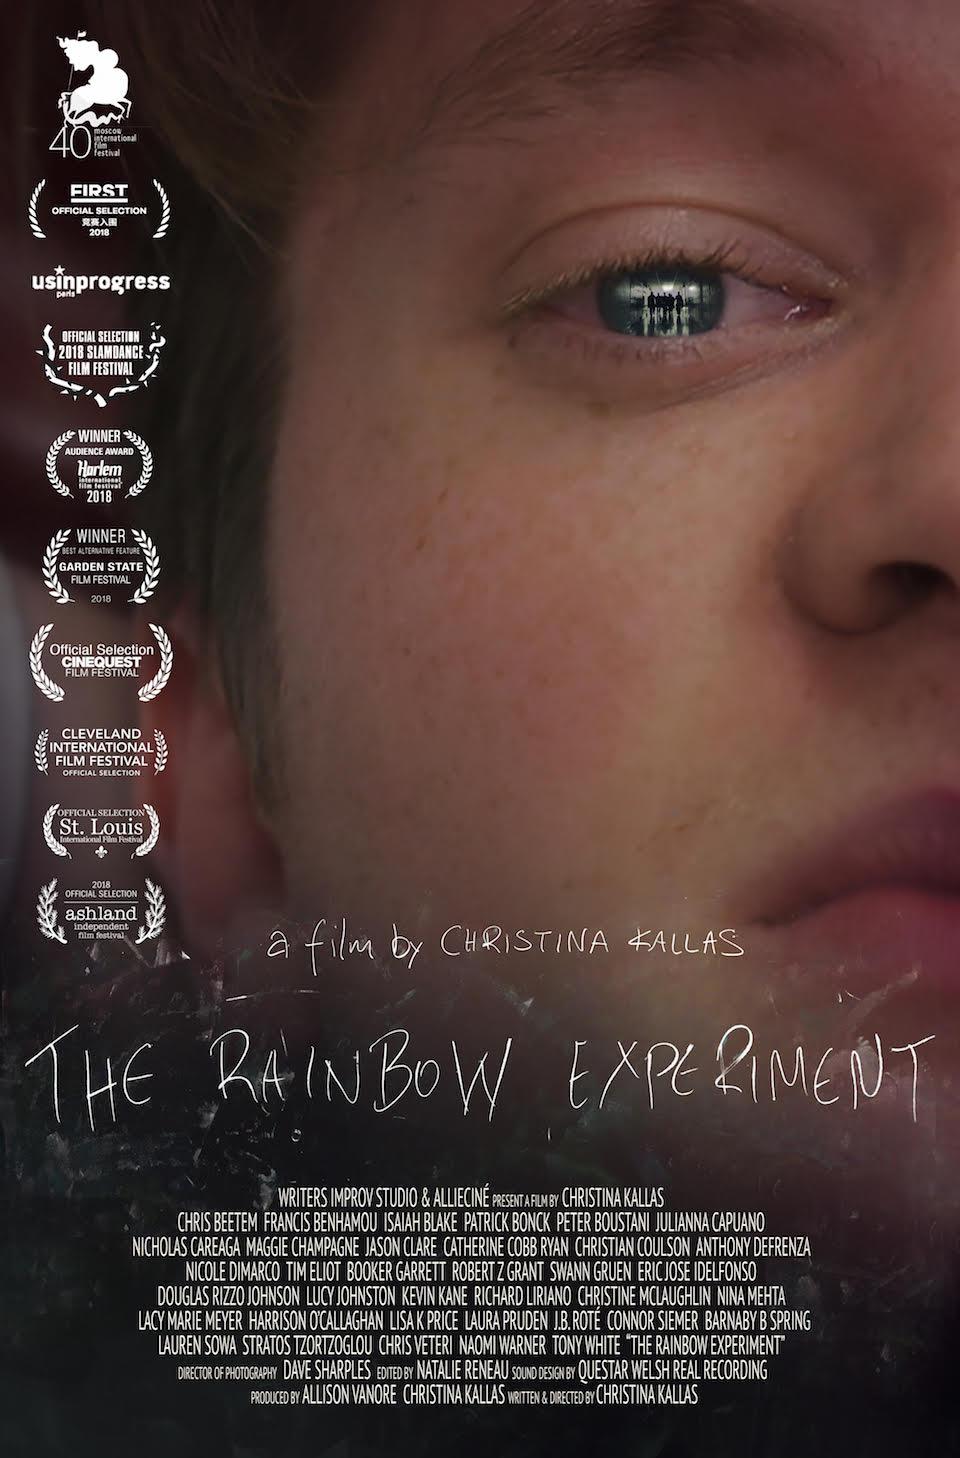 Rainbow Experiment